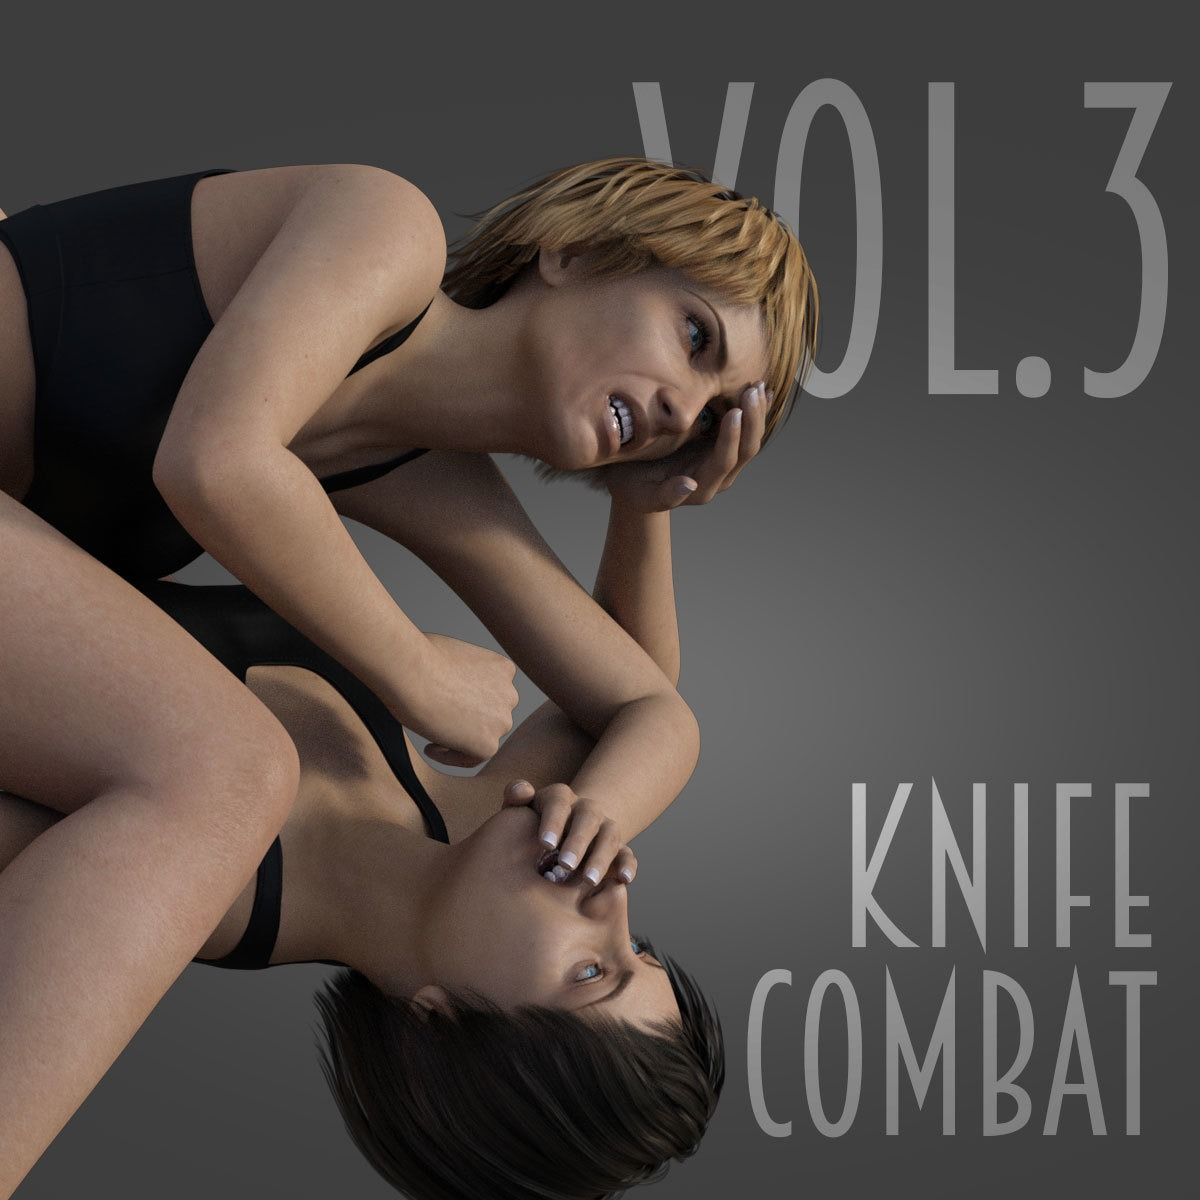 Knife Combat vol.3 for Genesis 8 Female_DAZ3D下载站